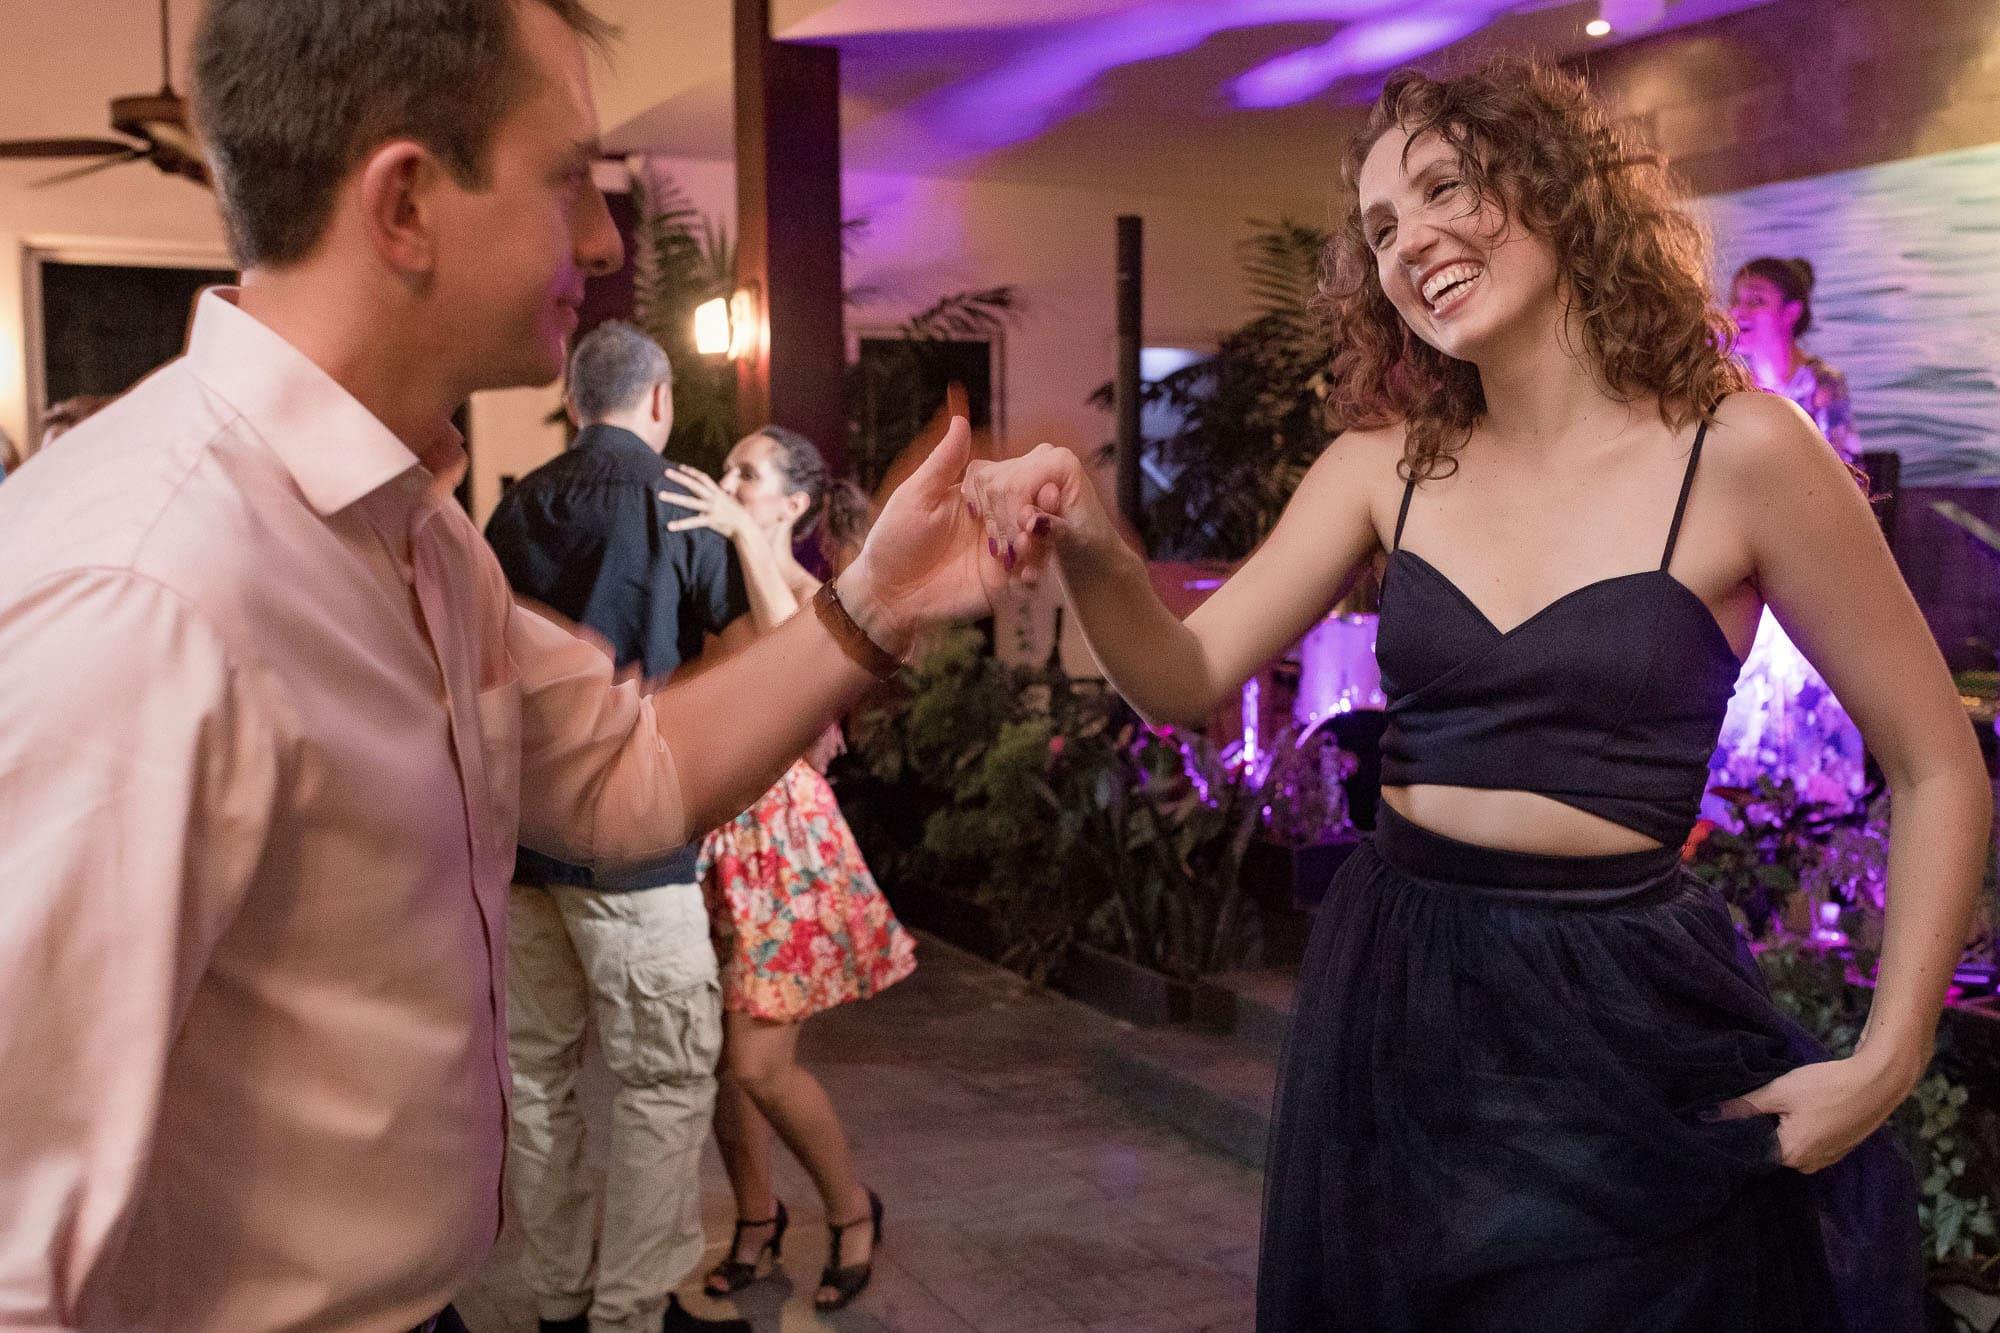 Having fun at the reception–Ukrainian style!